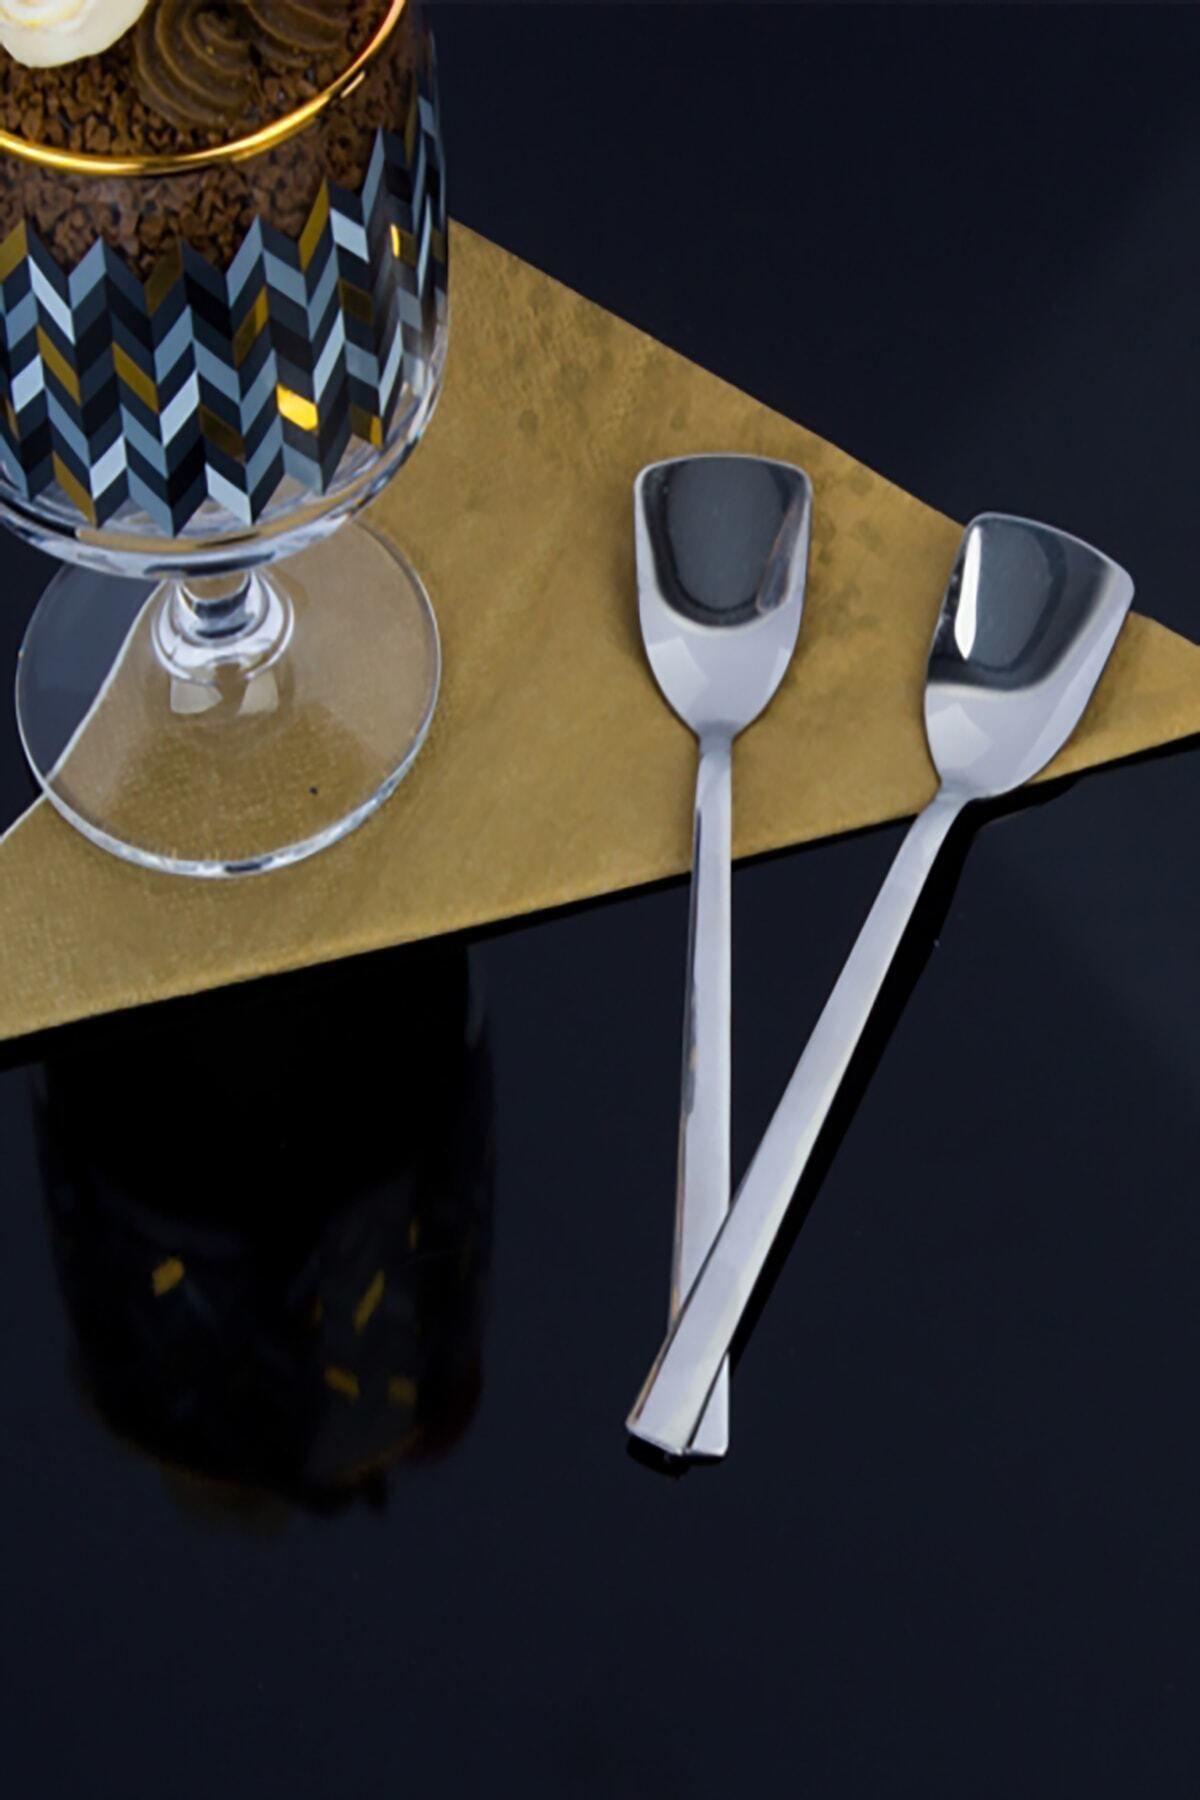 Kitchen Chef Paslanmaz Çelik 6'lı Lüx Dondurma Kaşığı 2